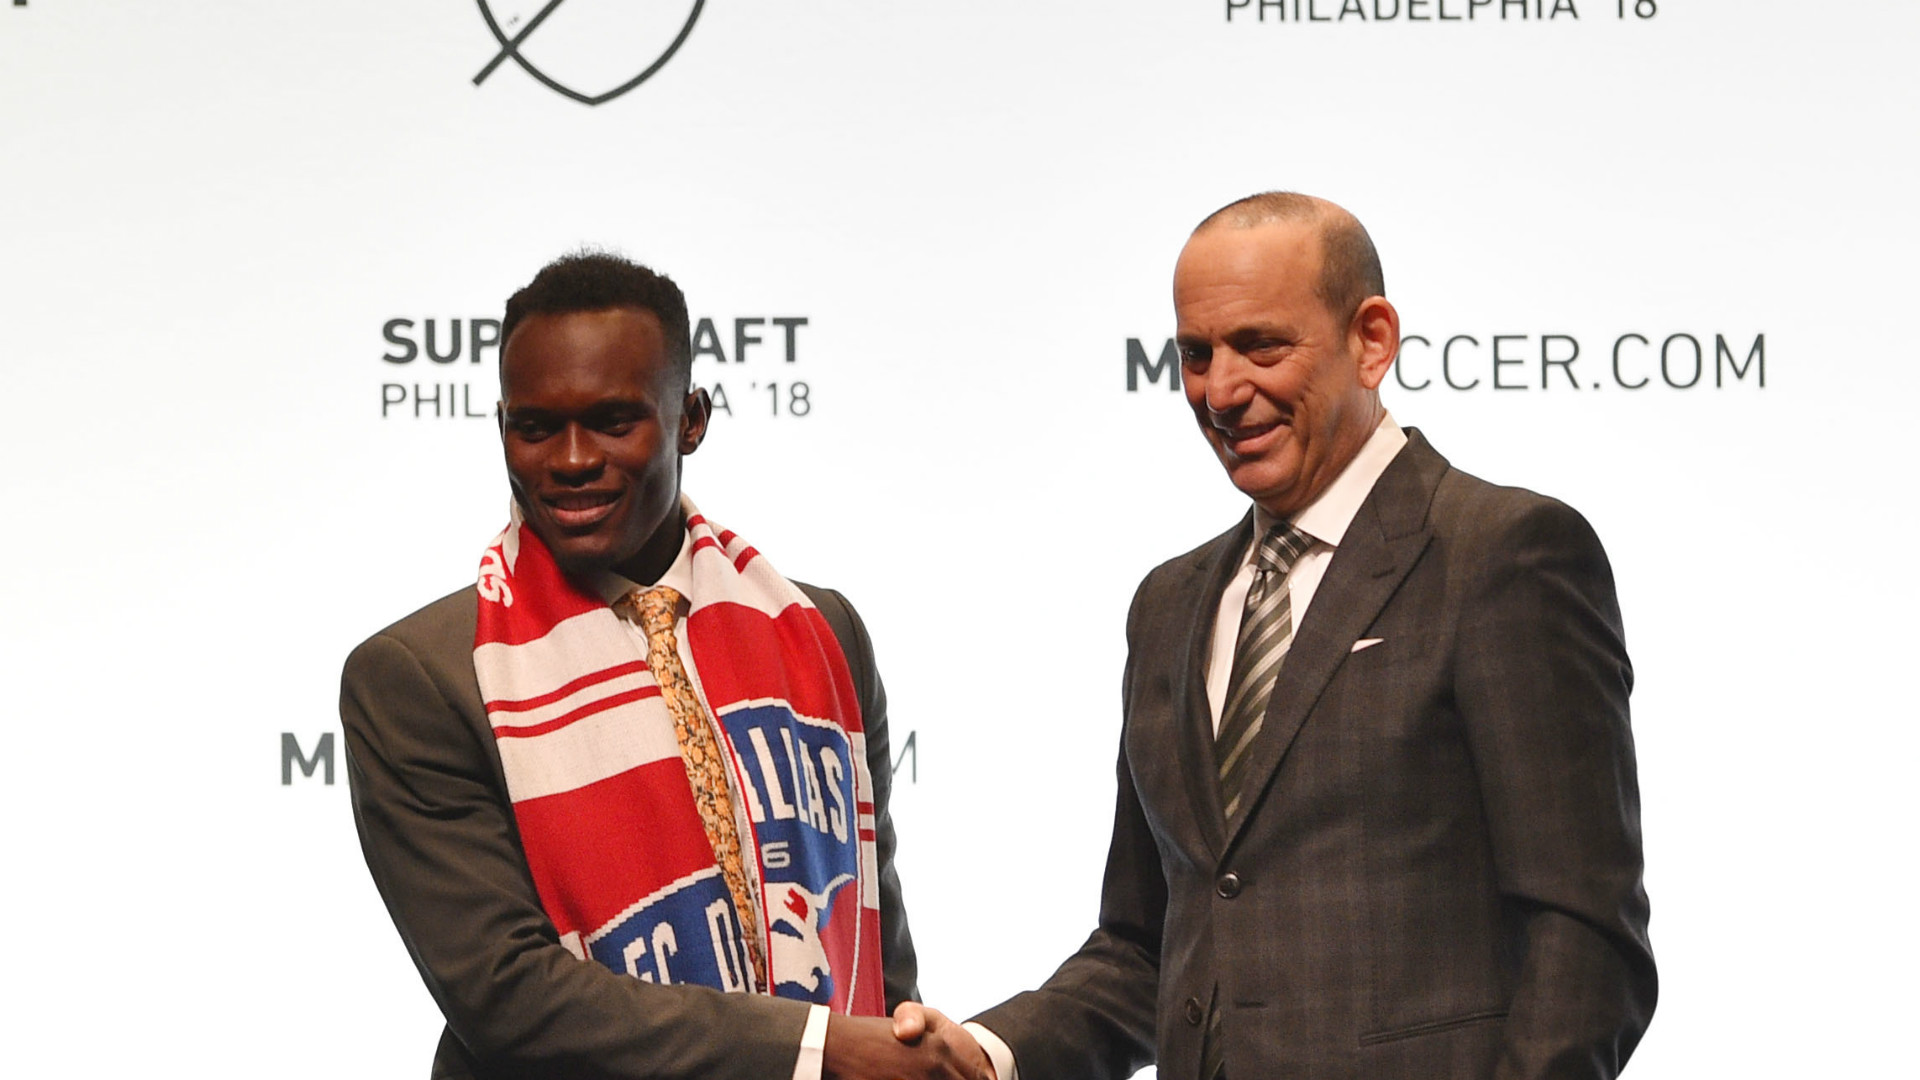 Francis Atuahene MLS Draft 01192018